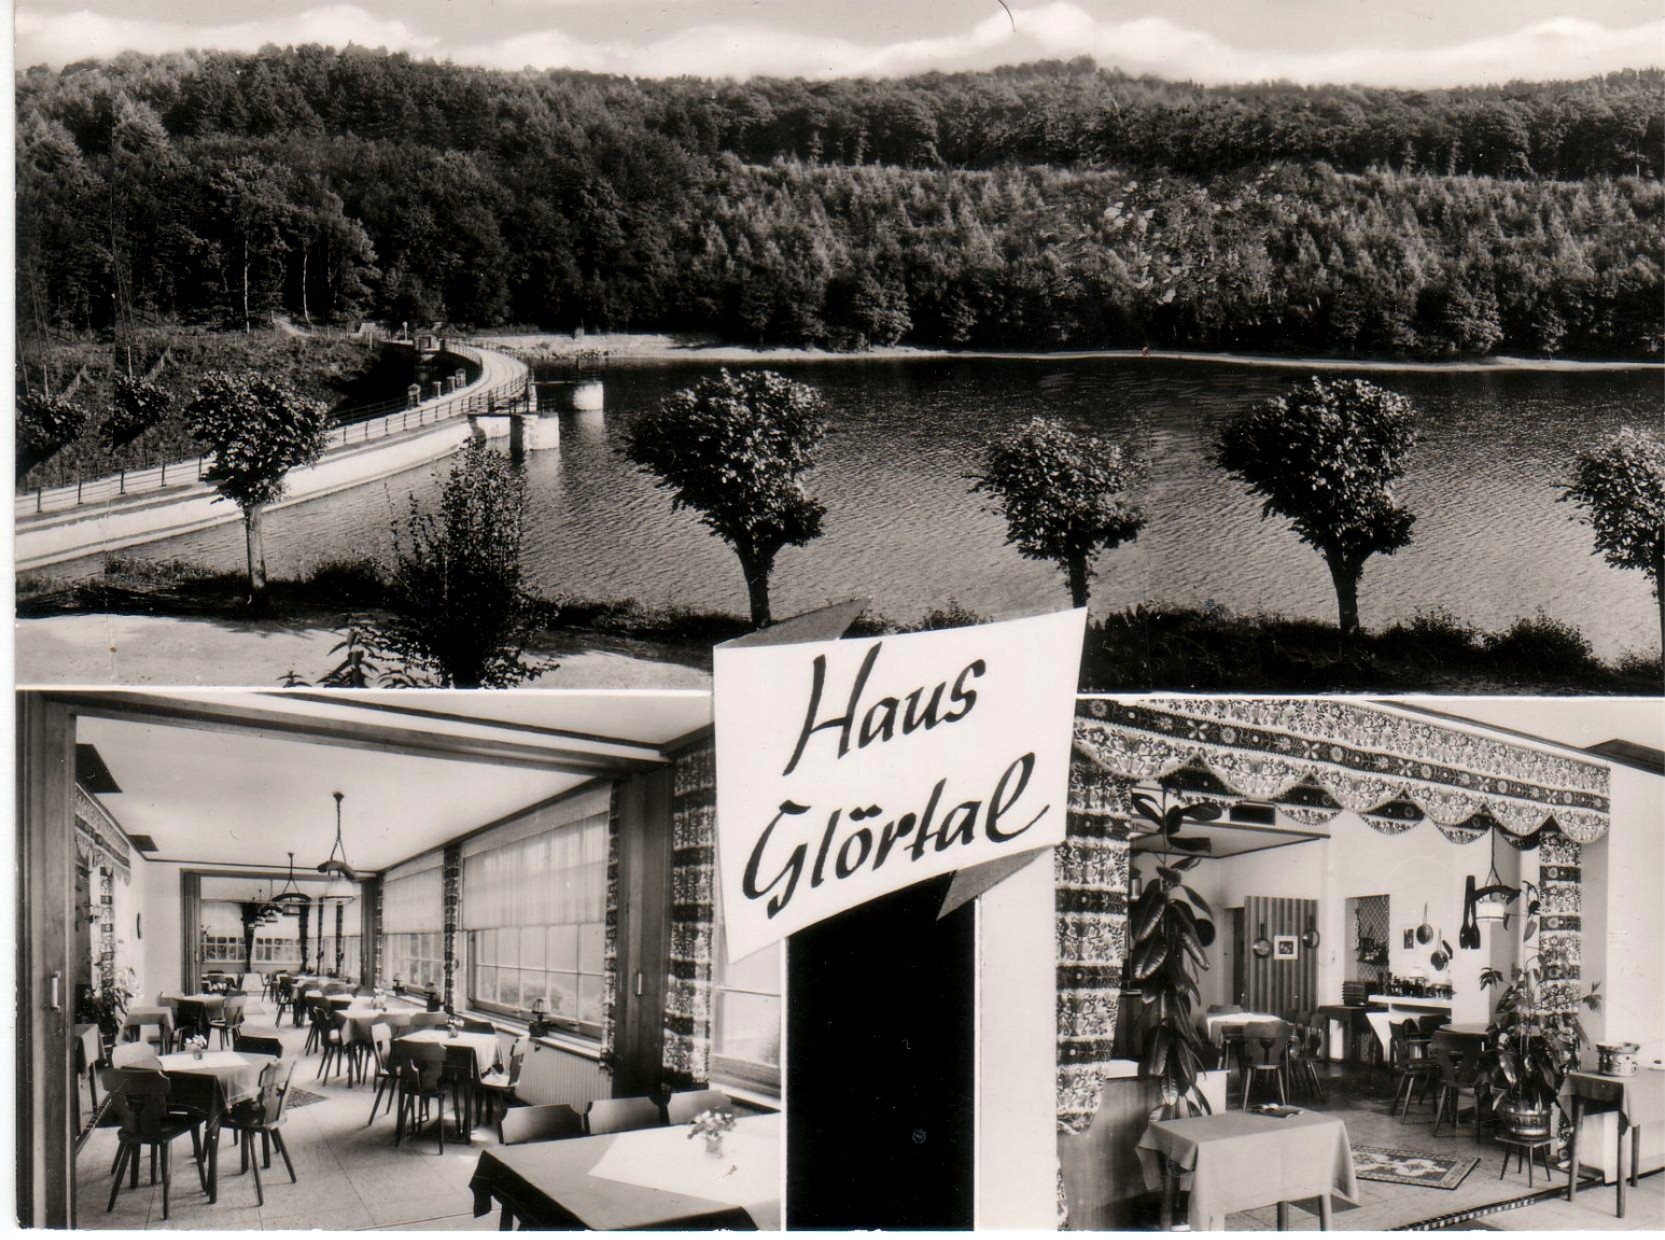 Haus Glörtal-his